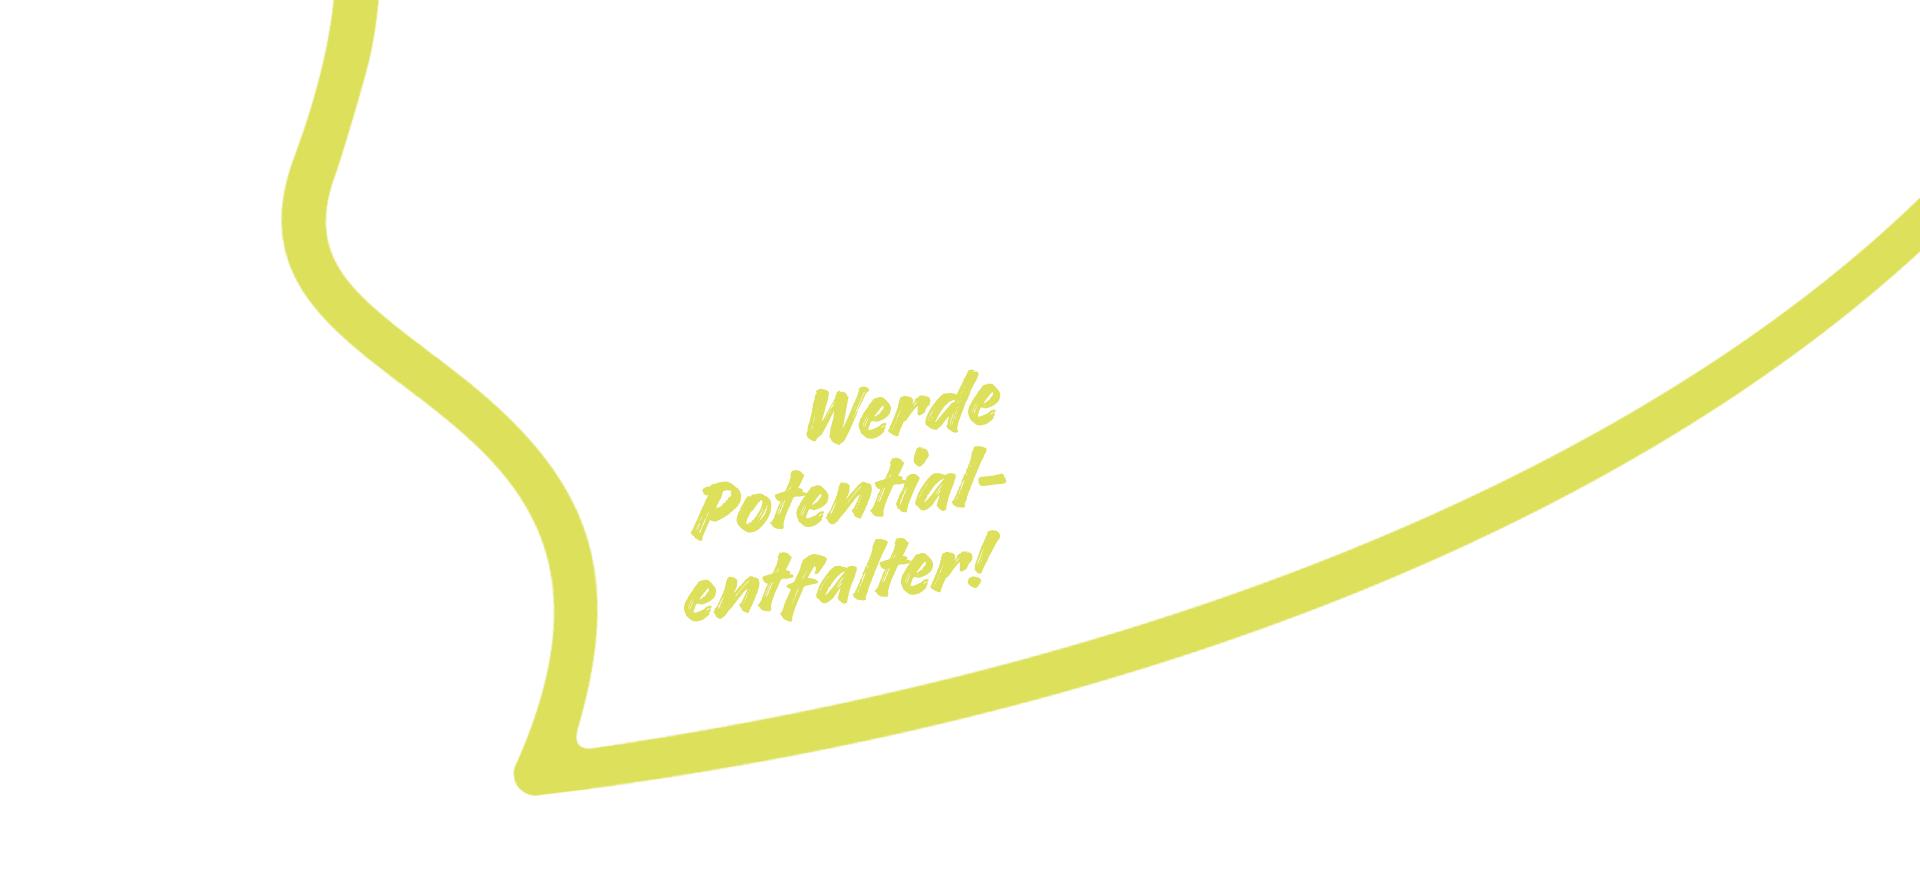 HERO_SOCIETY-Werde_Potentialentfalter